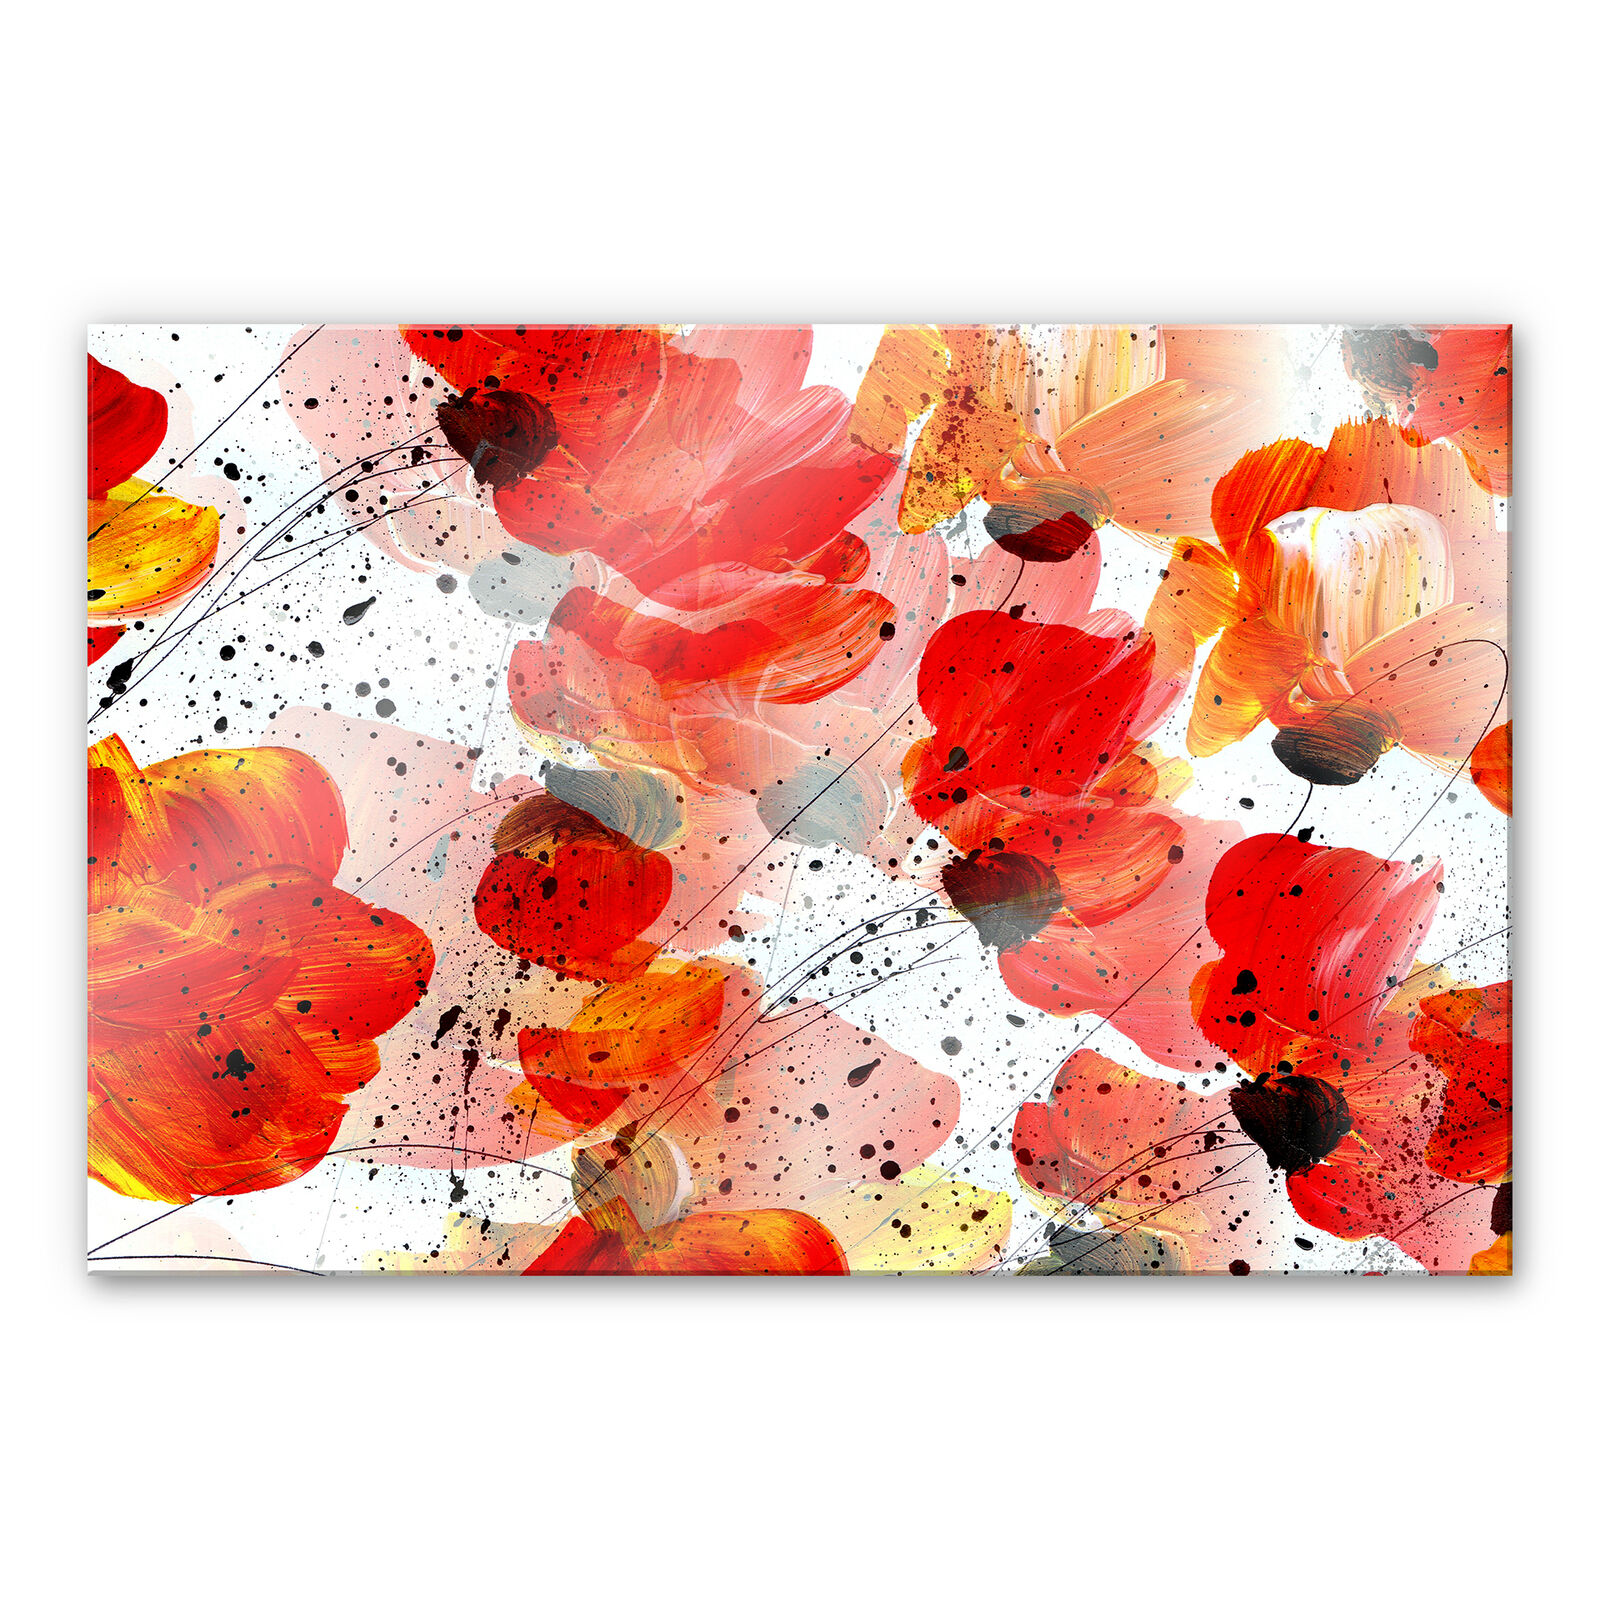 Acrylglas Acrylglasbild Niksic - Frühlingsfest bunt